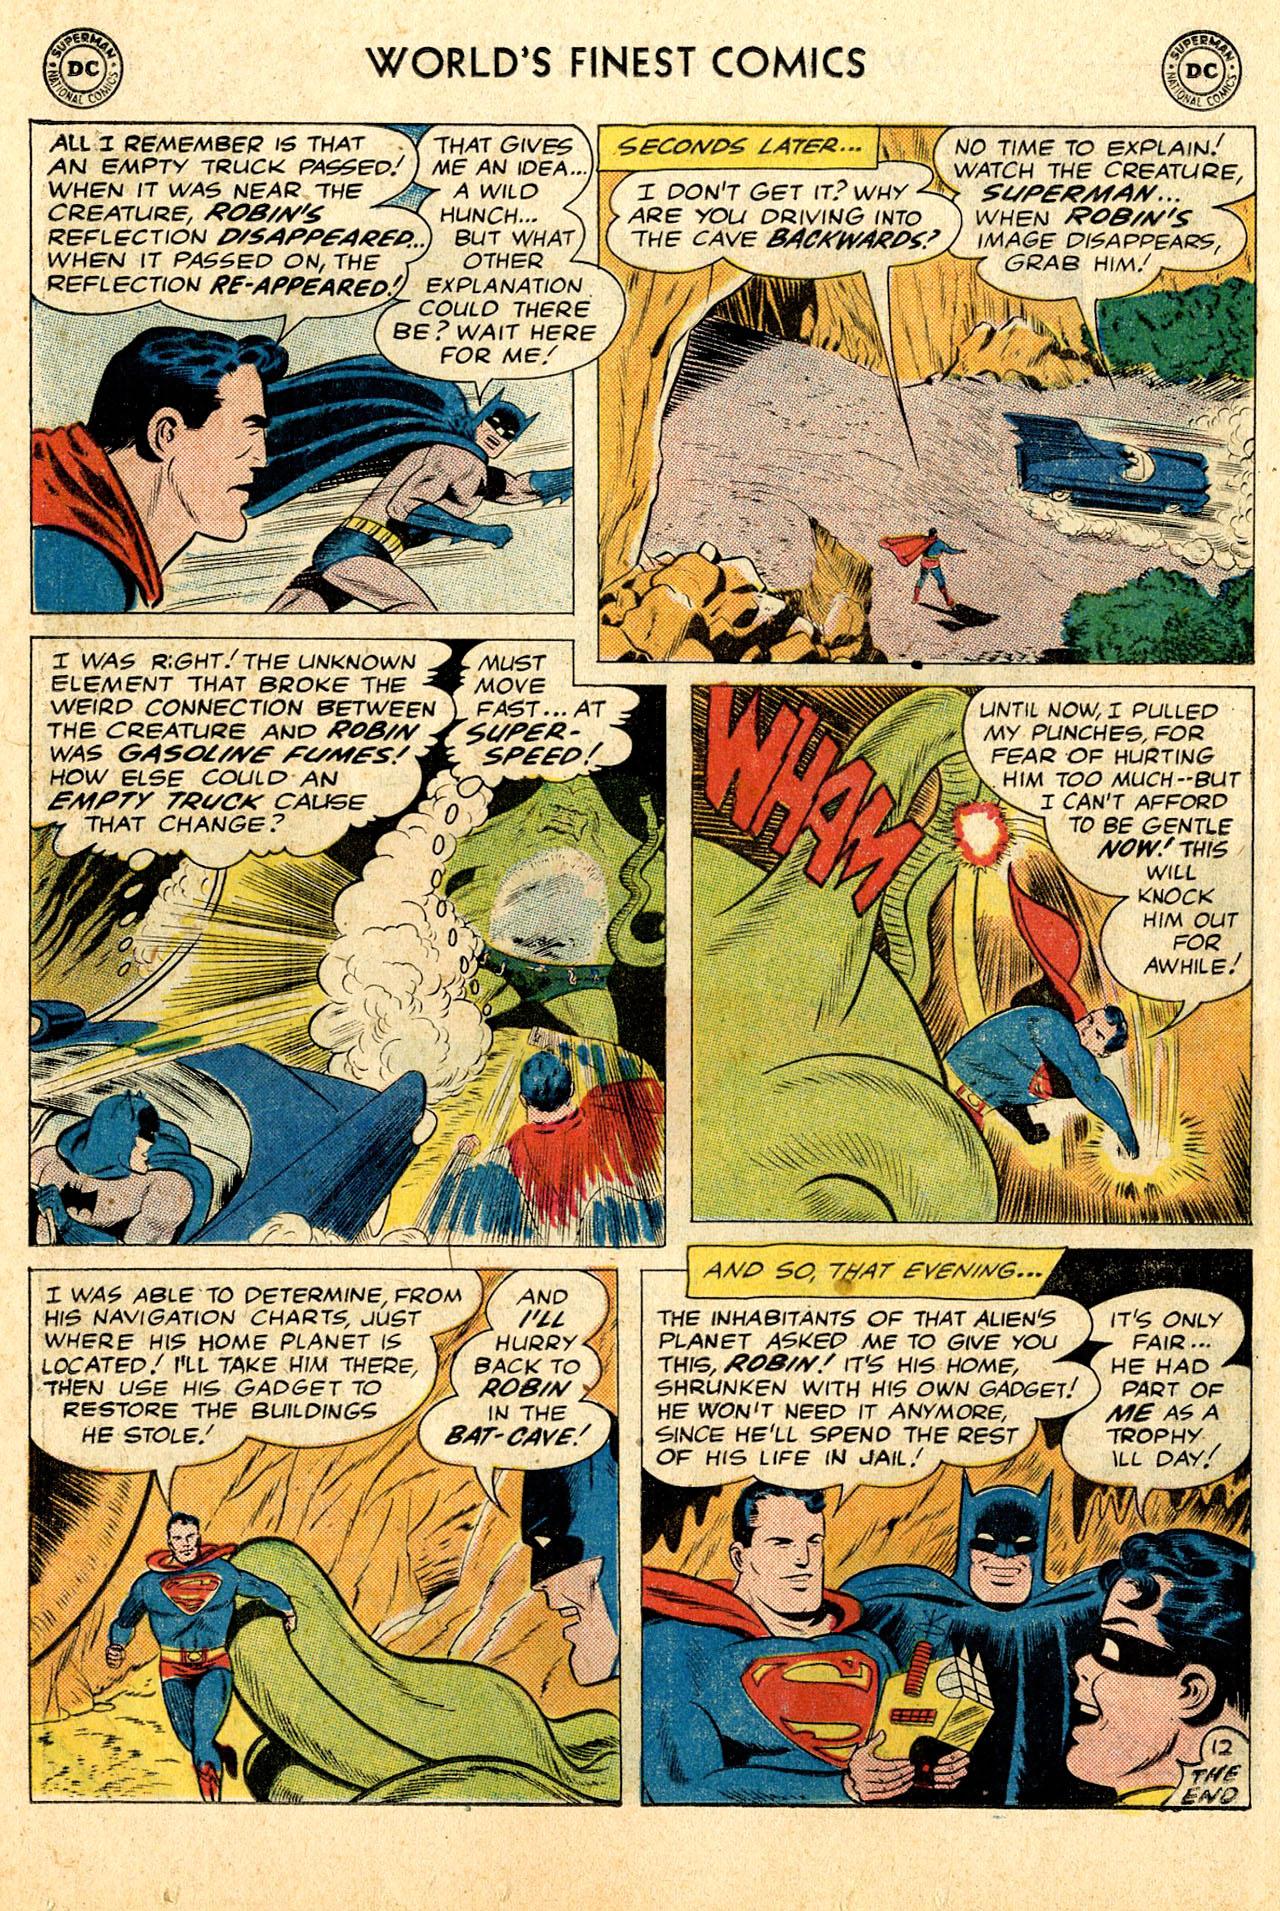 Read online World's Finest Comics comic -  Issue #110 - 14